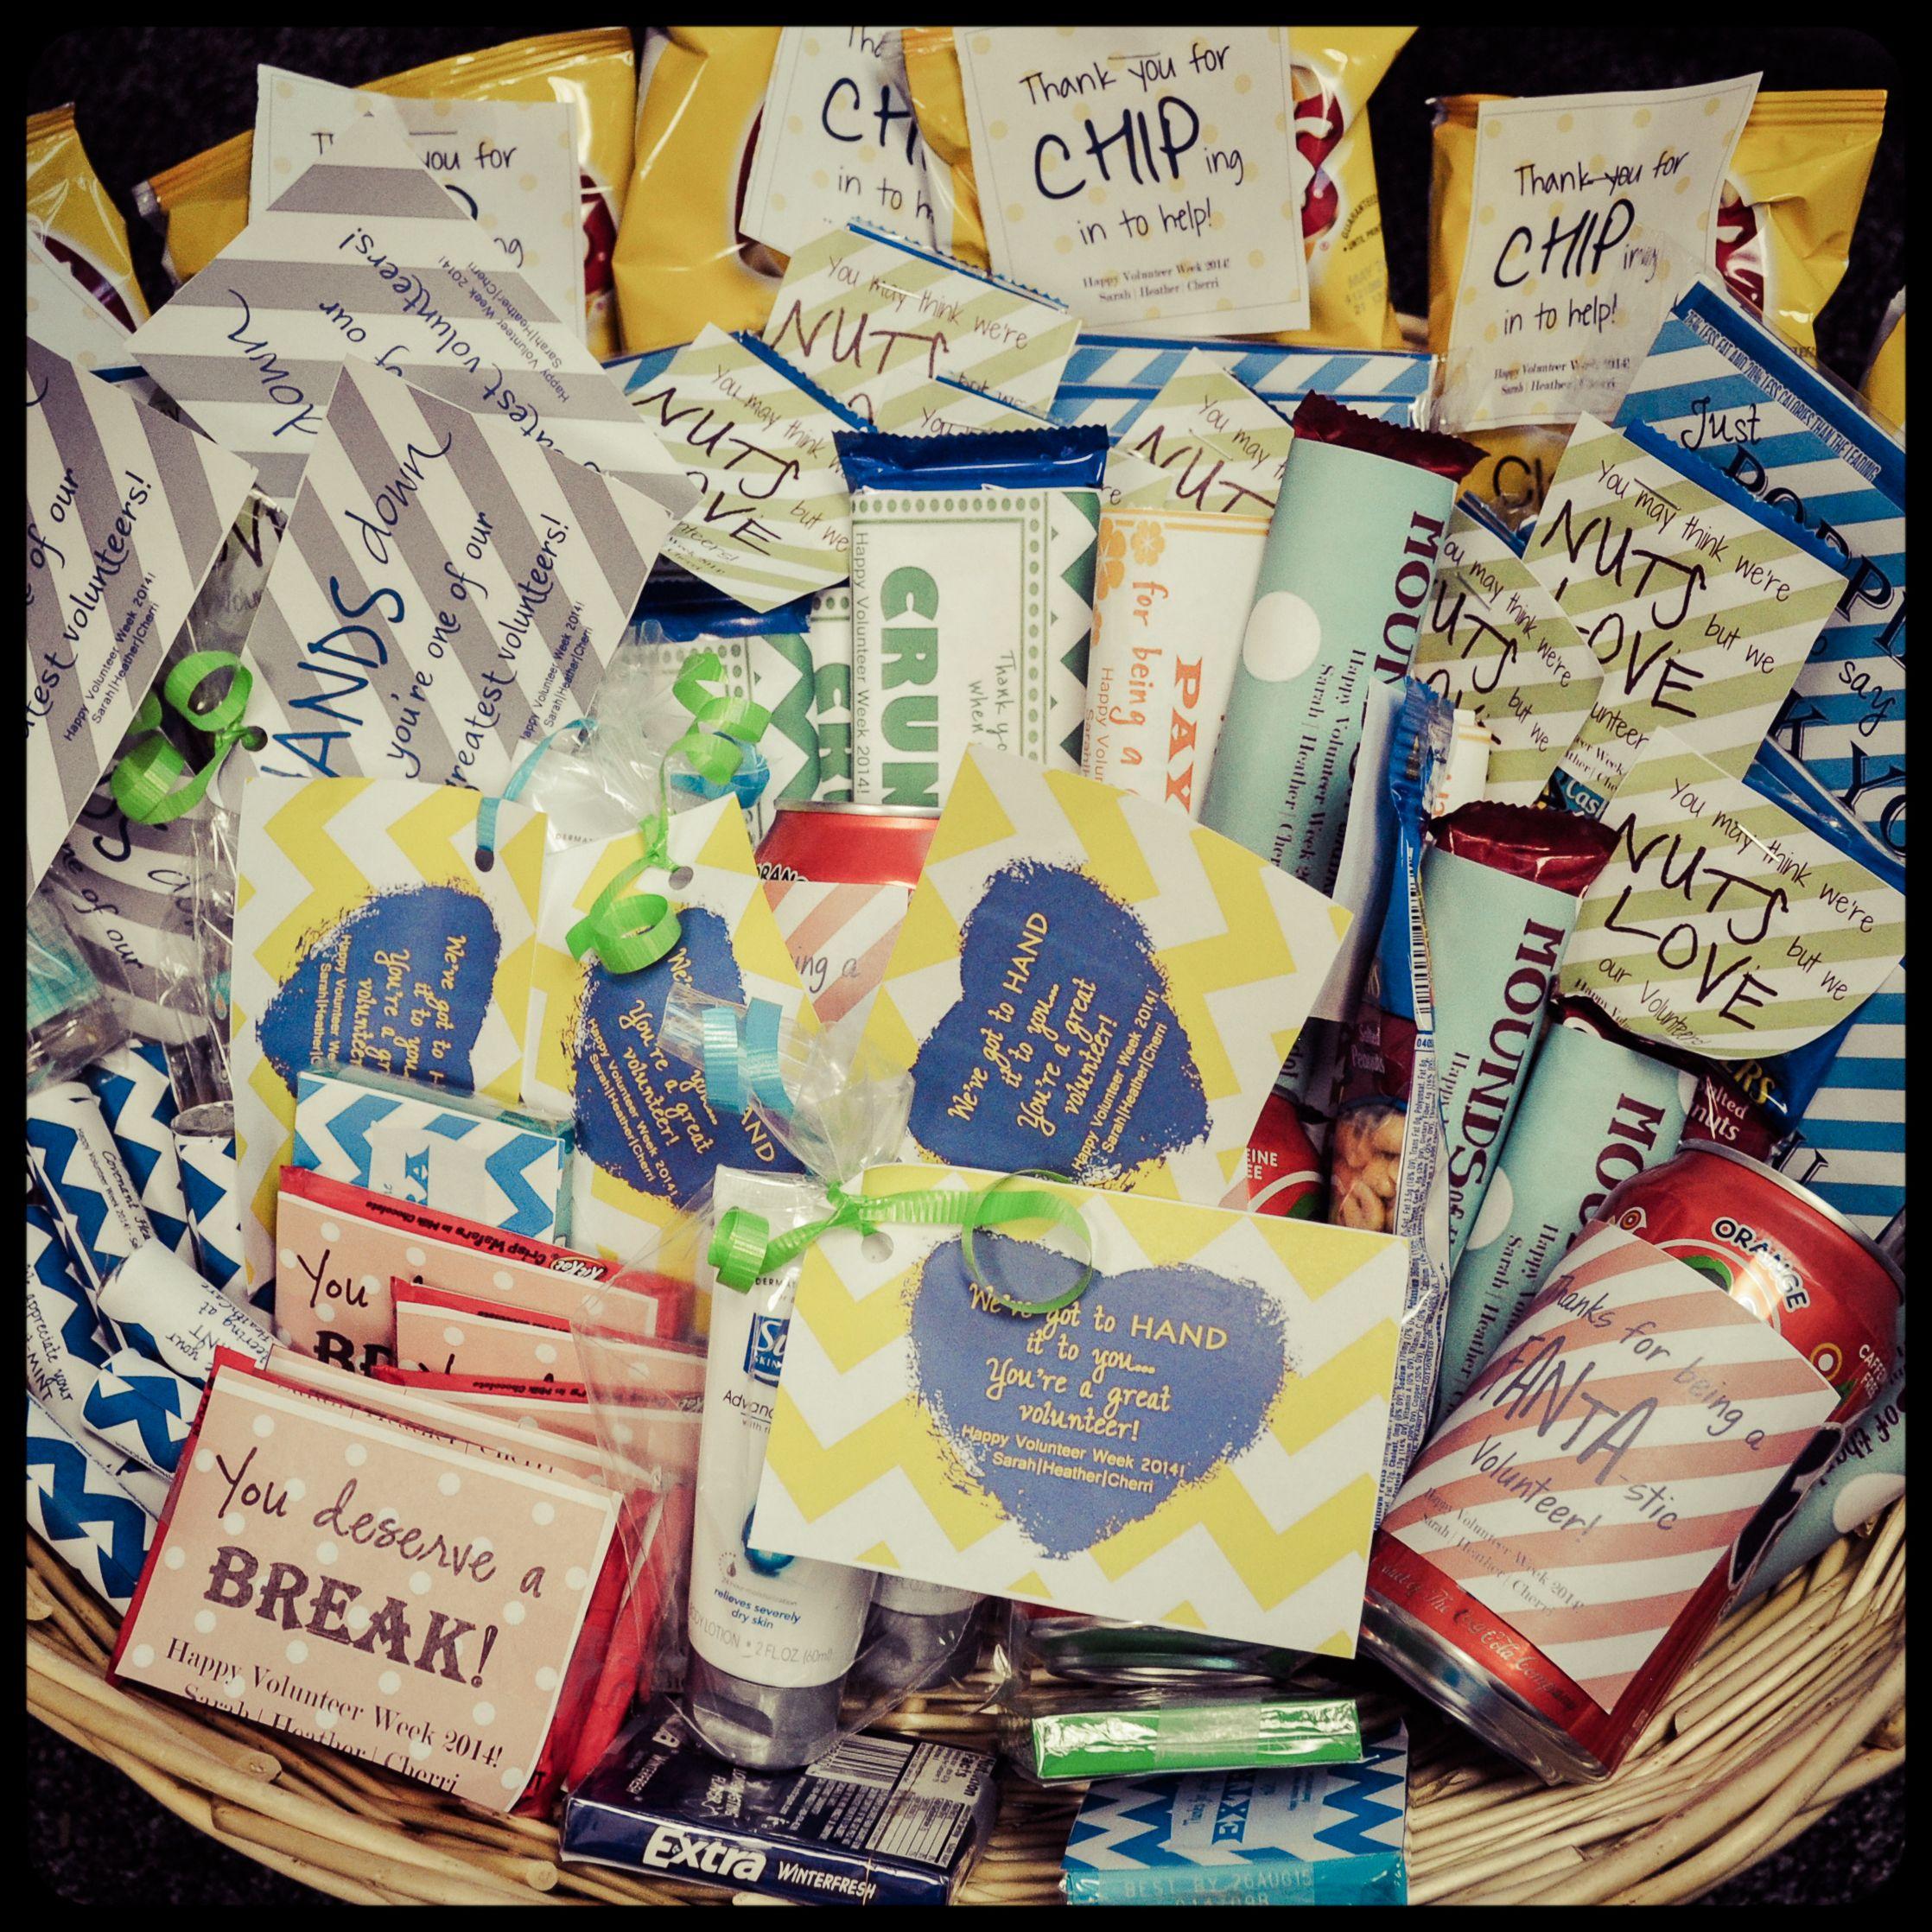 Pin by Tabitha Gray on employee appreciation ideas | Pinterest